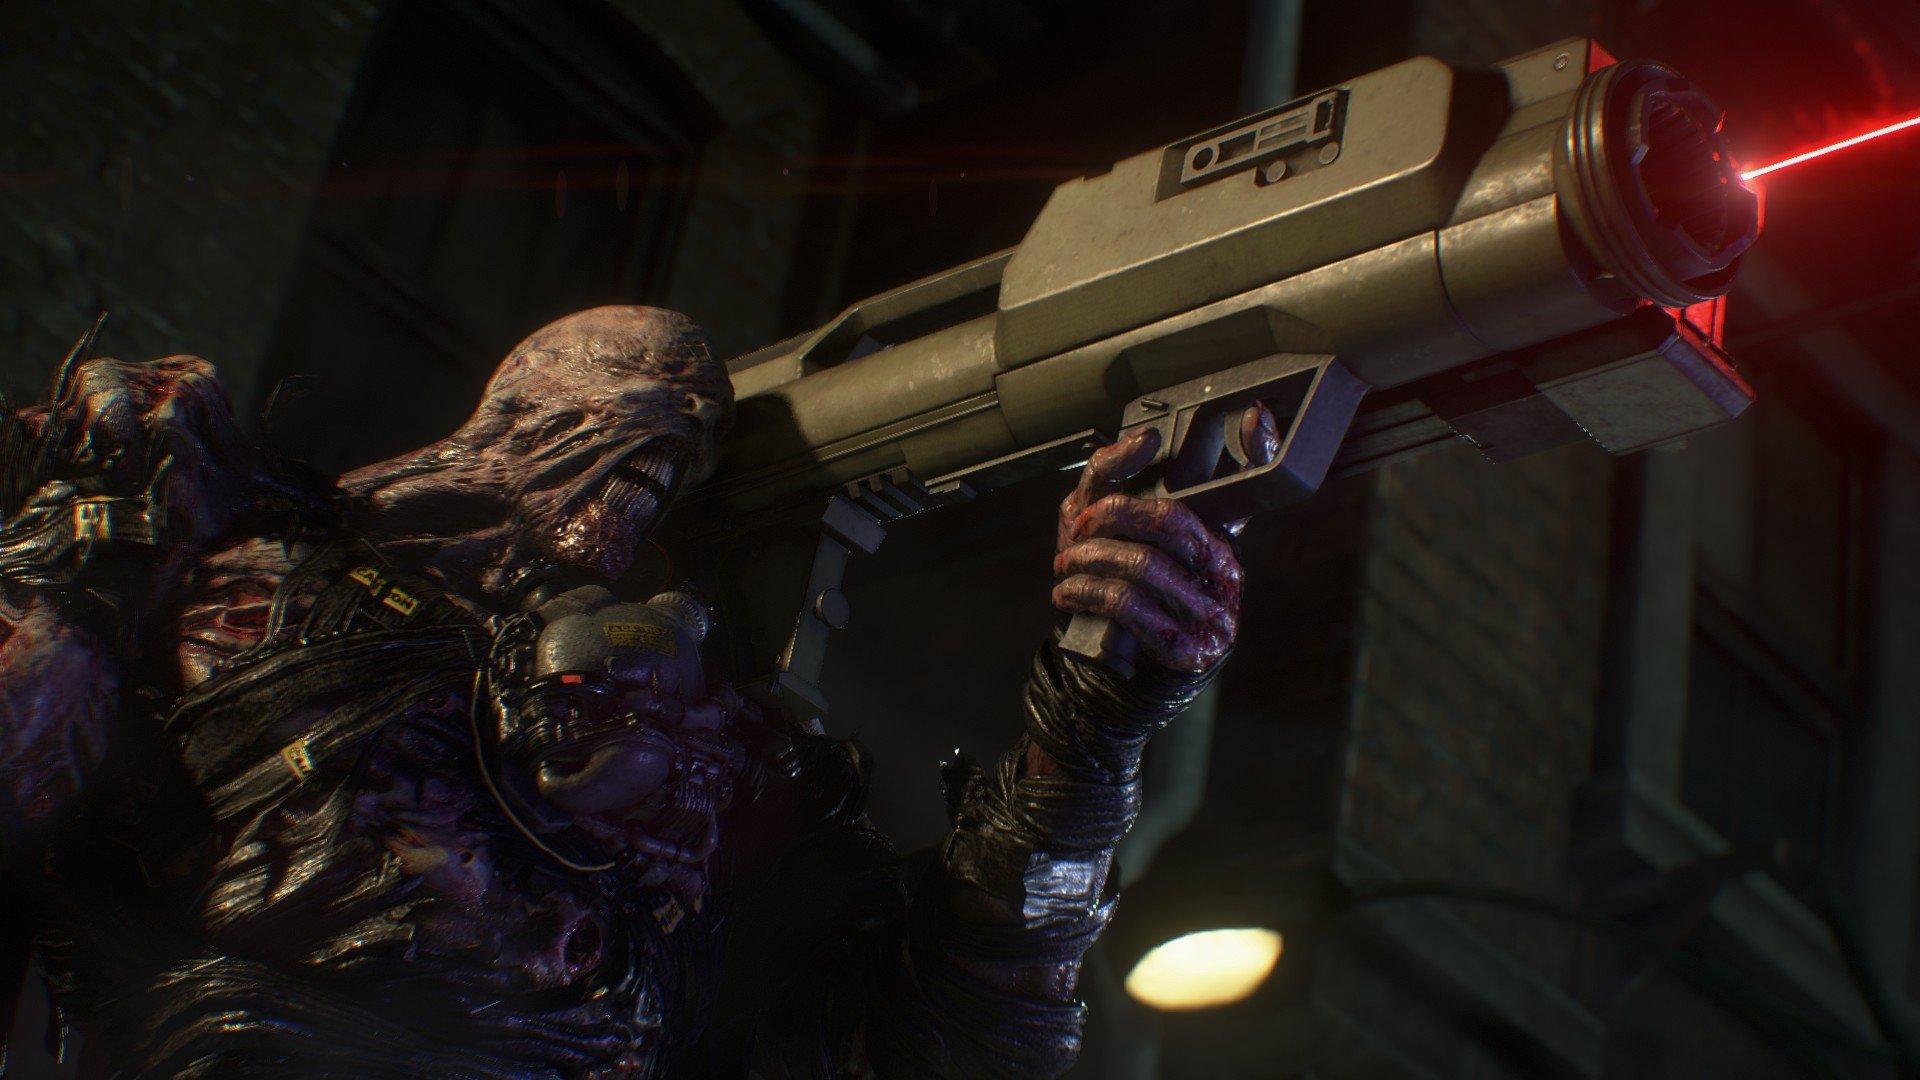 Wallpaper Resident Evil 3 Remake Video Games Creature Nemesis